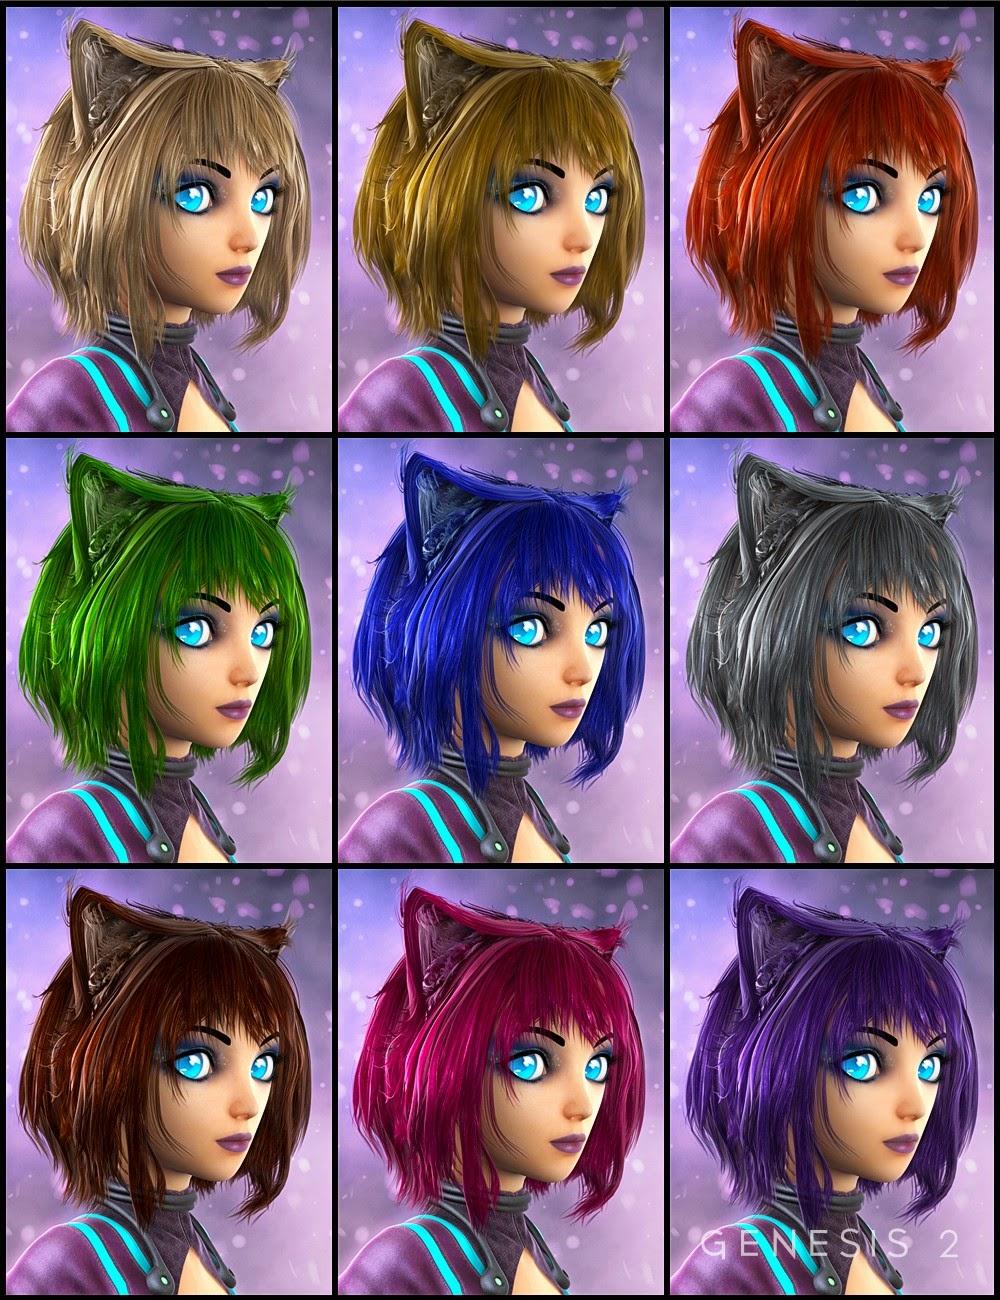 Anime Kitten cheveux pour Genesis 2 Femme